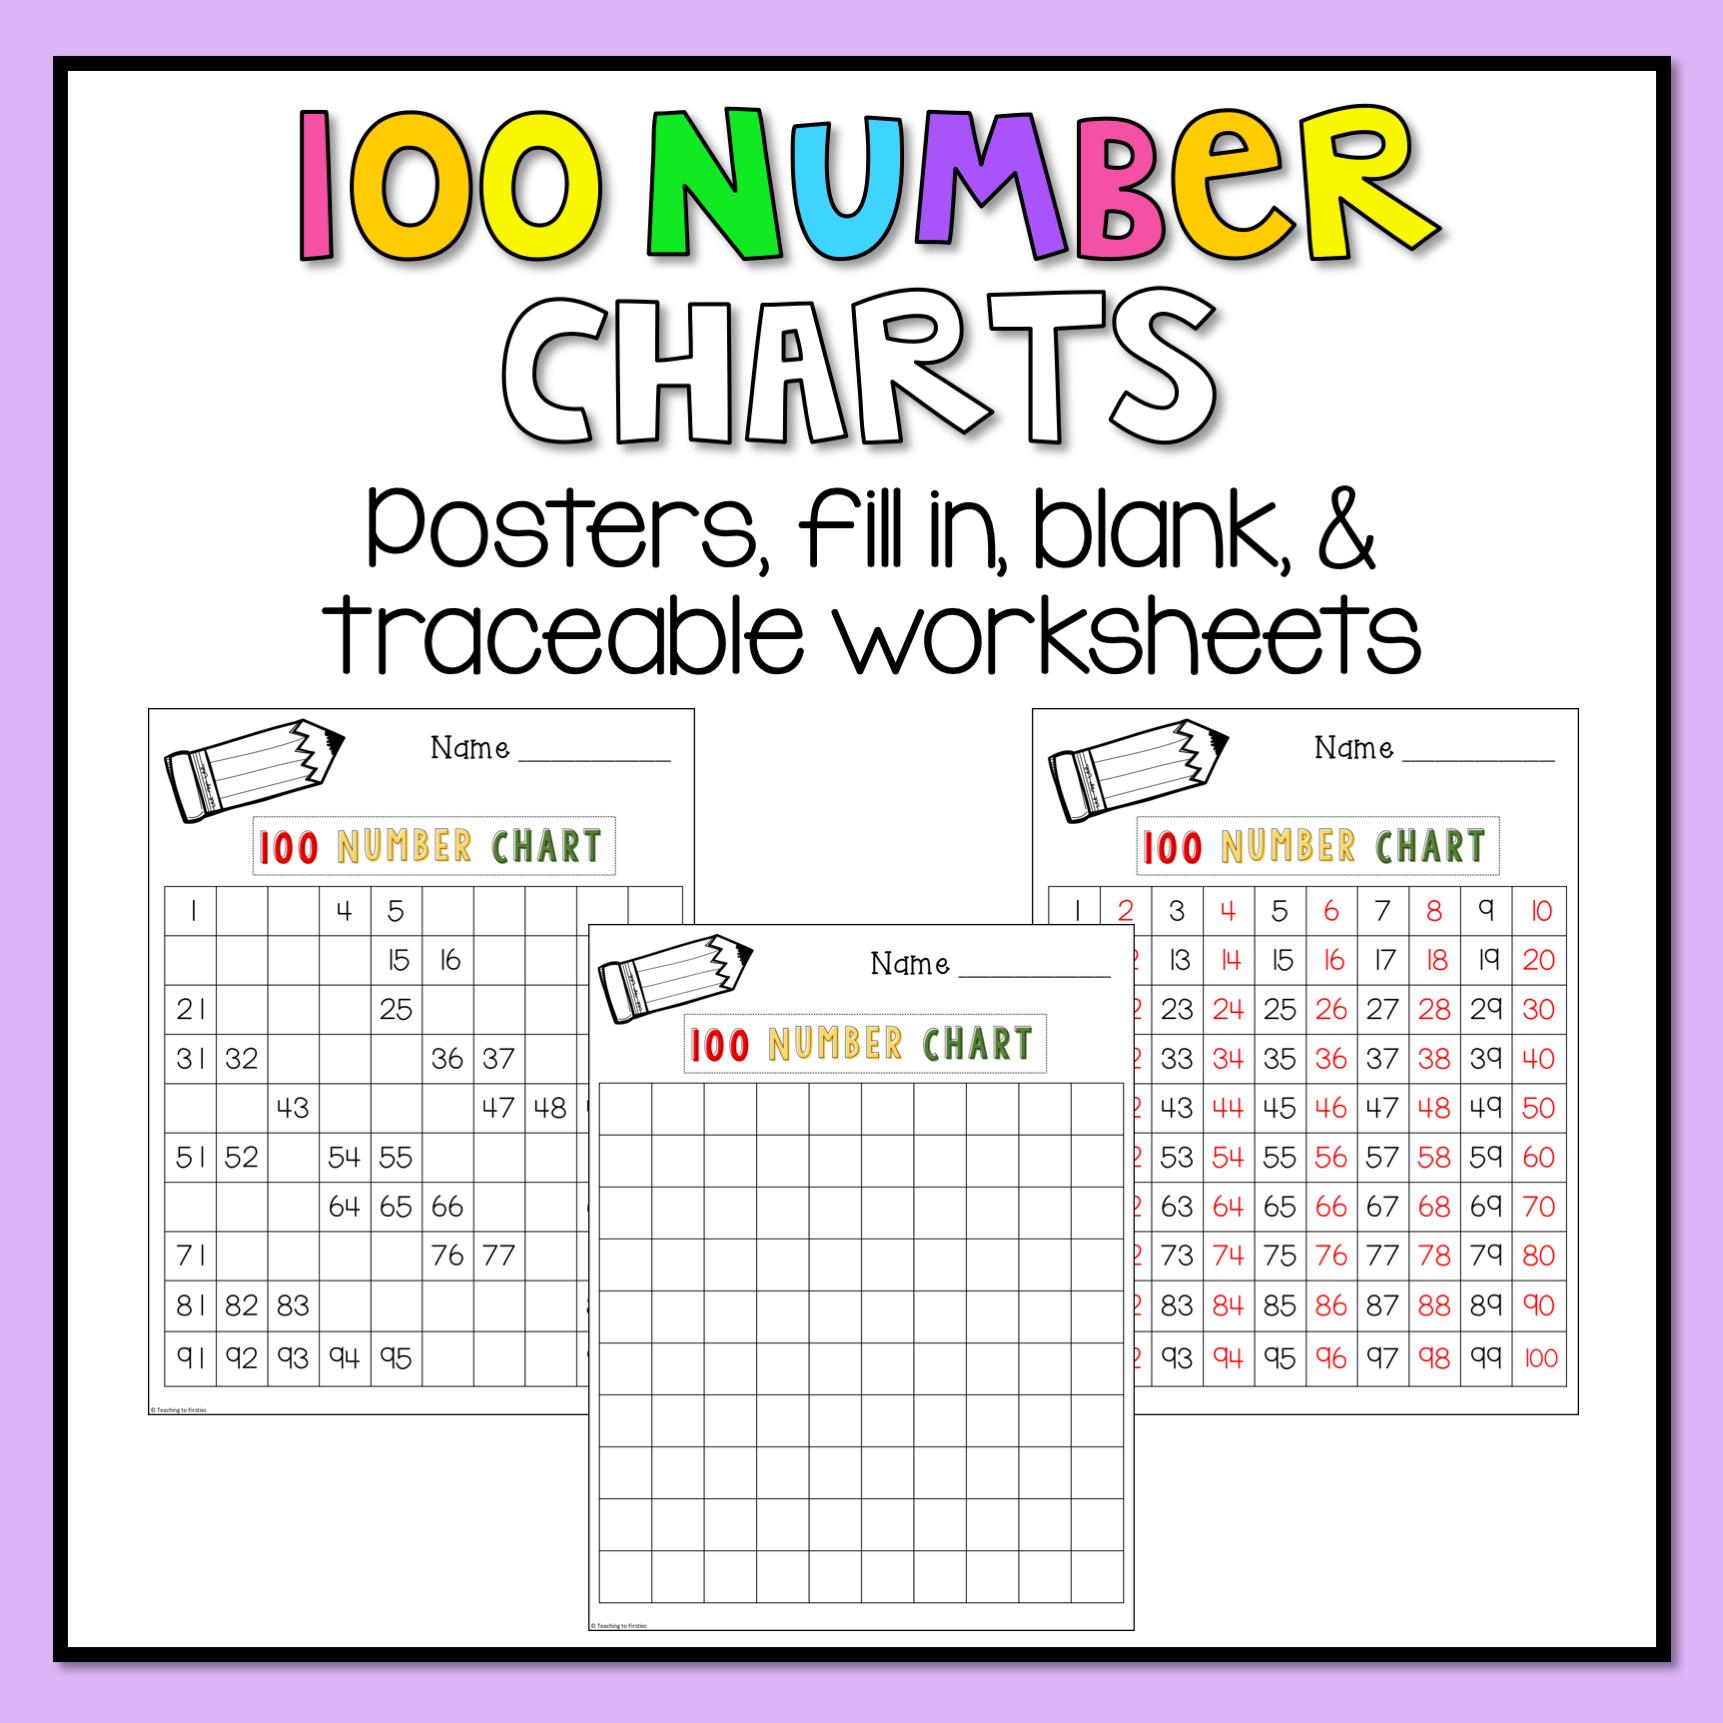 100 Number Chart Worksheets